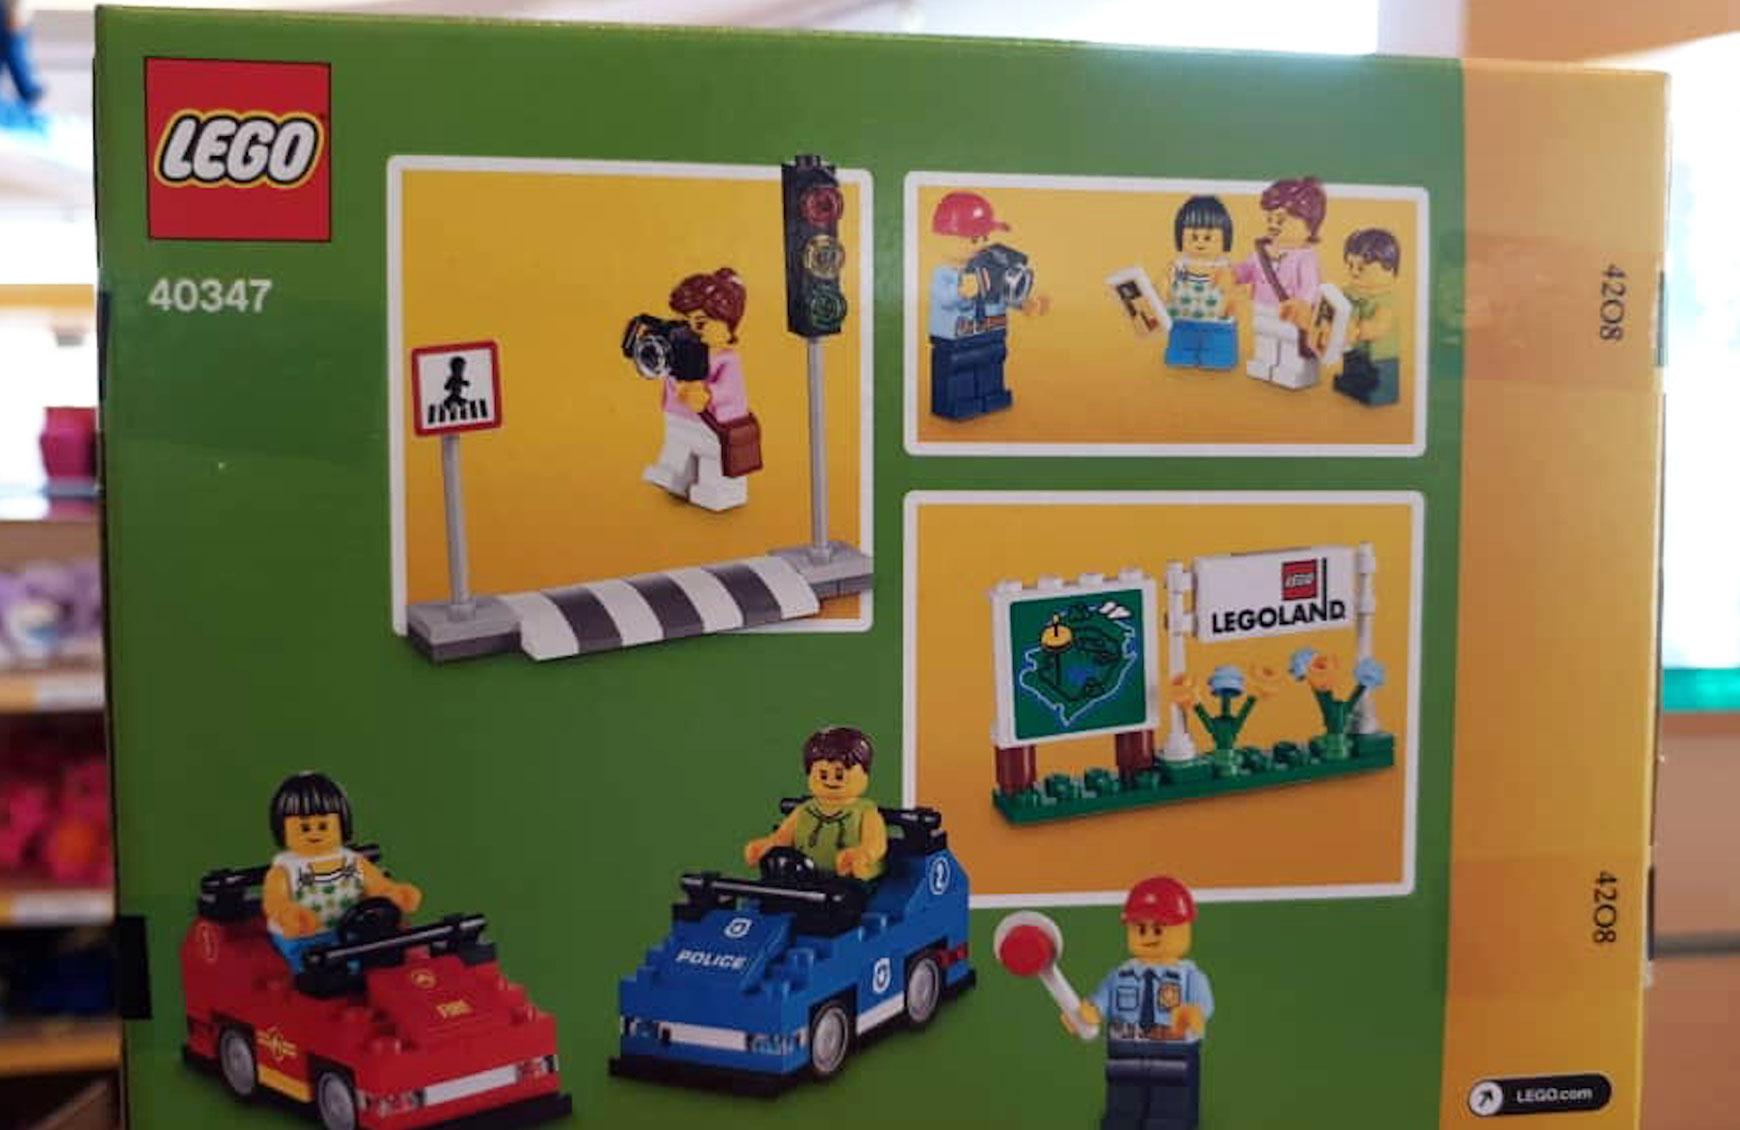 legoland-driving-school-fahrschule-40347-back-box-2019 zusammengebaut.com